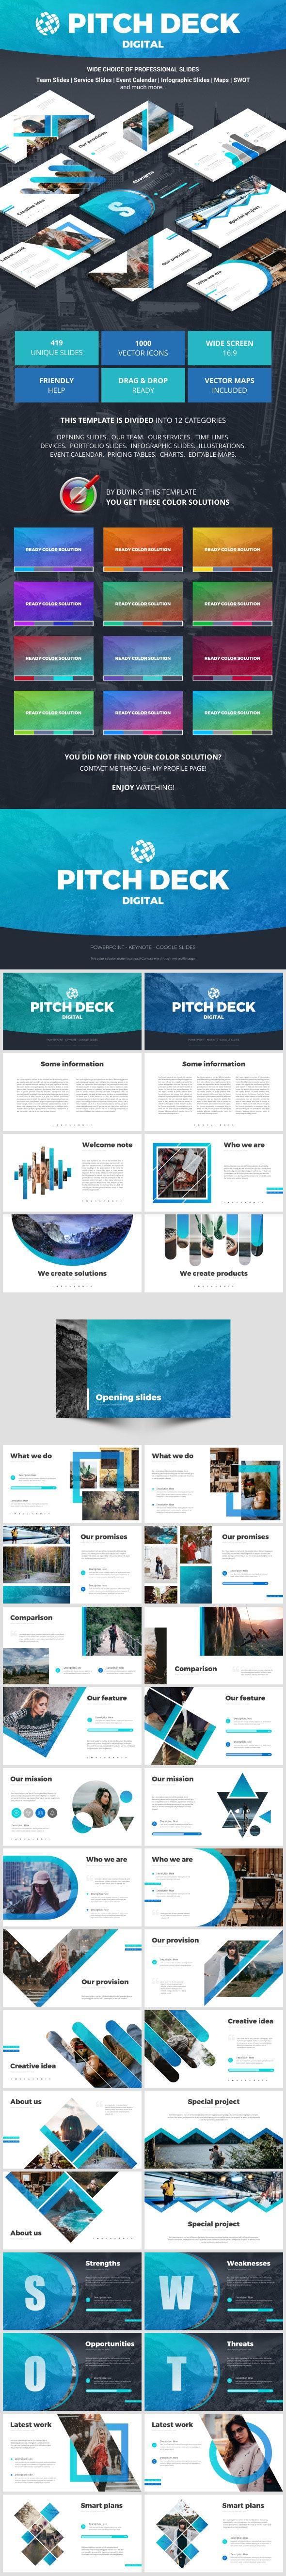 Pitch Deck Digital - Pitch Deck PowerPoint Templates